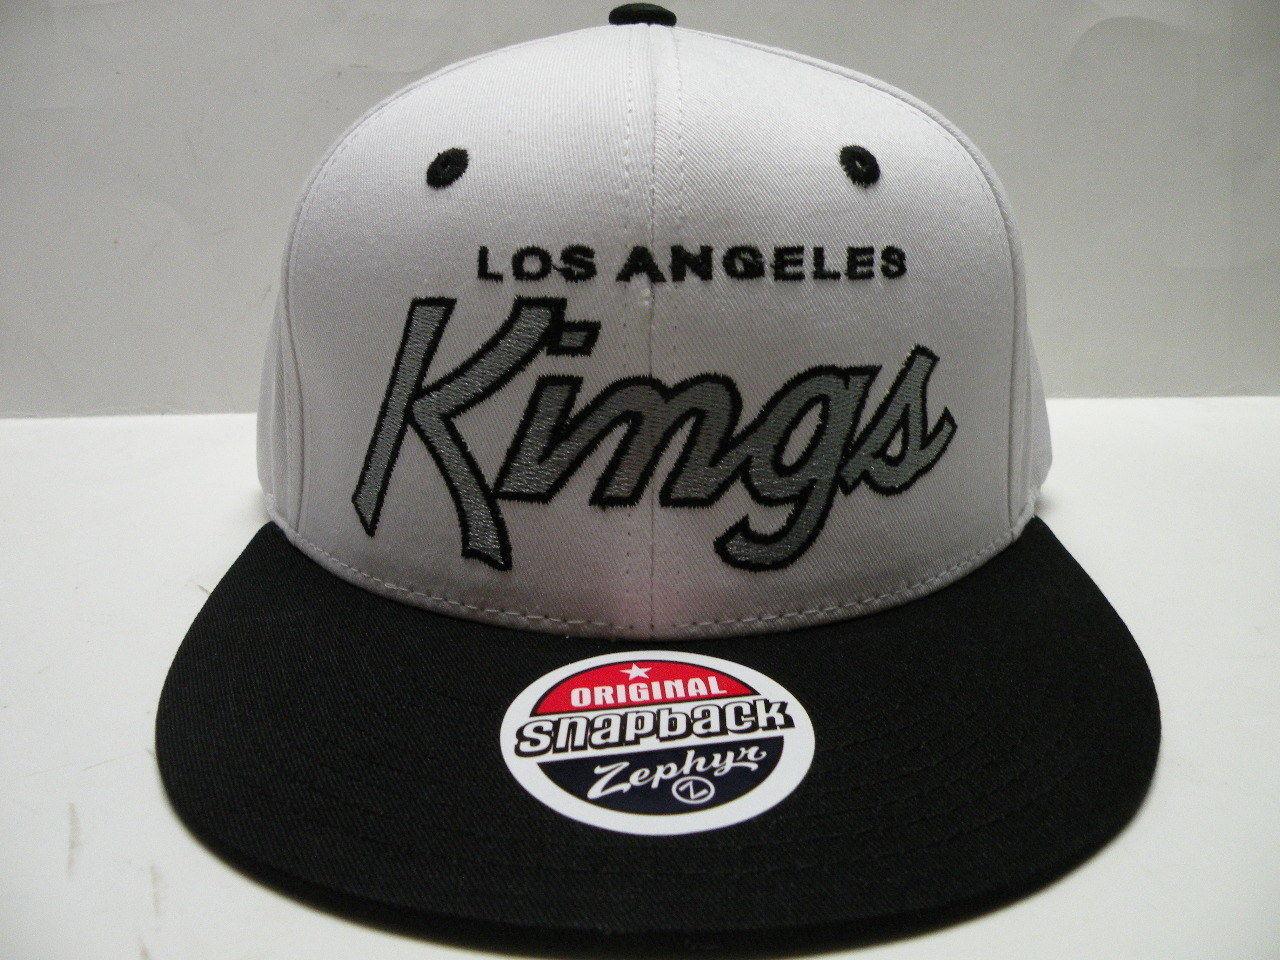 b60f7a5bc63 Zephyr NHL Los Angeles Kings White Black 2 and 42 similar items